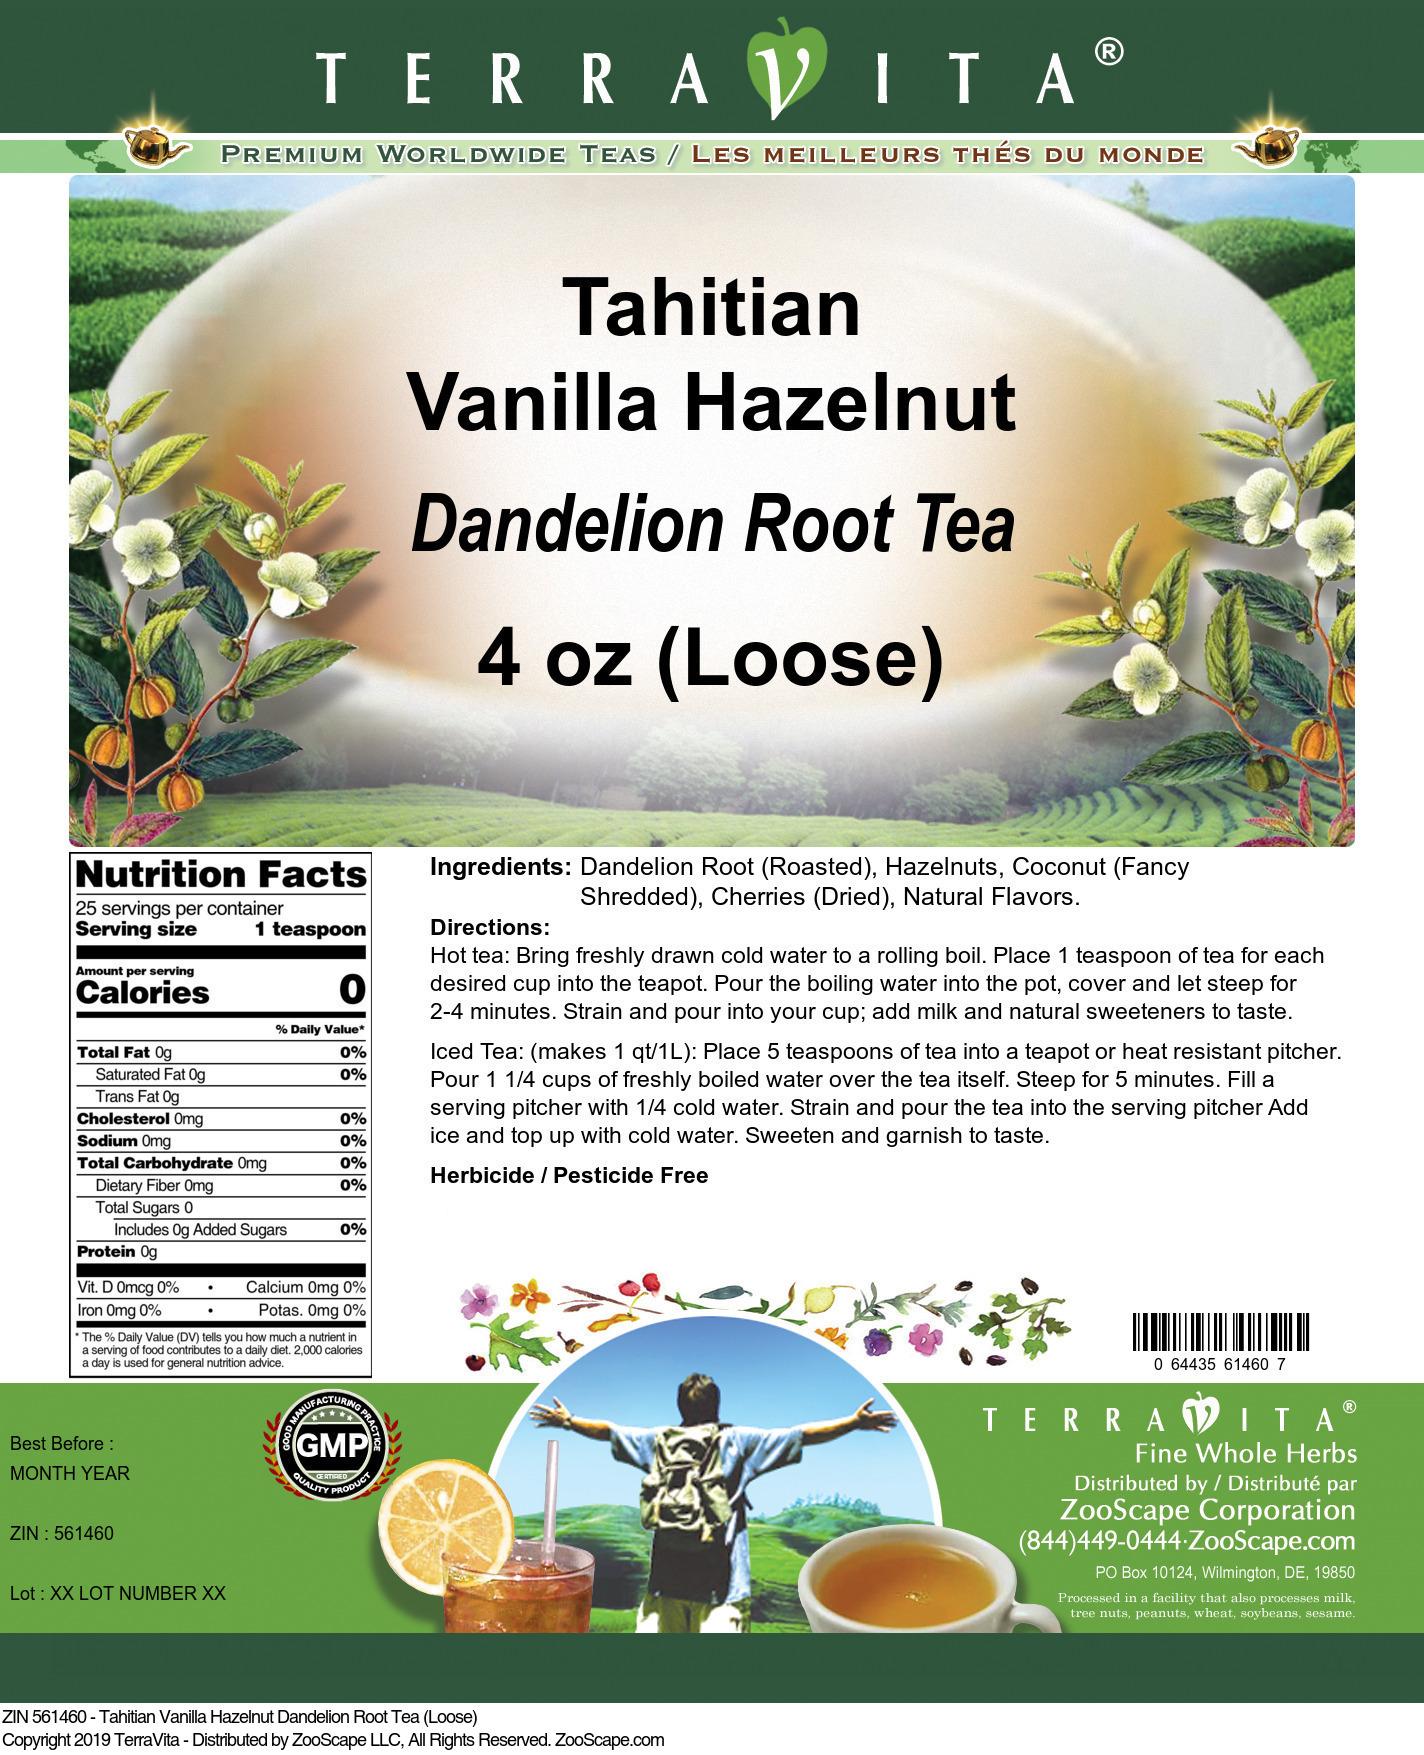 Tahitian Vanilla Hazelnut Dandelion Root Tea (Loose)